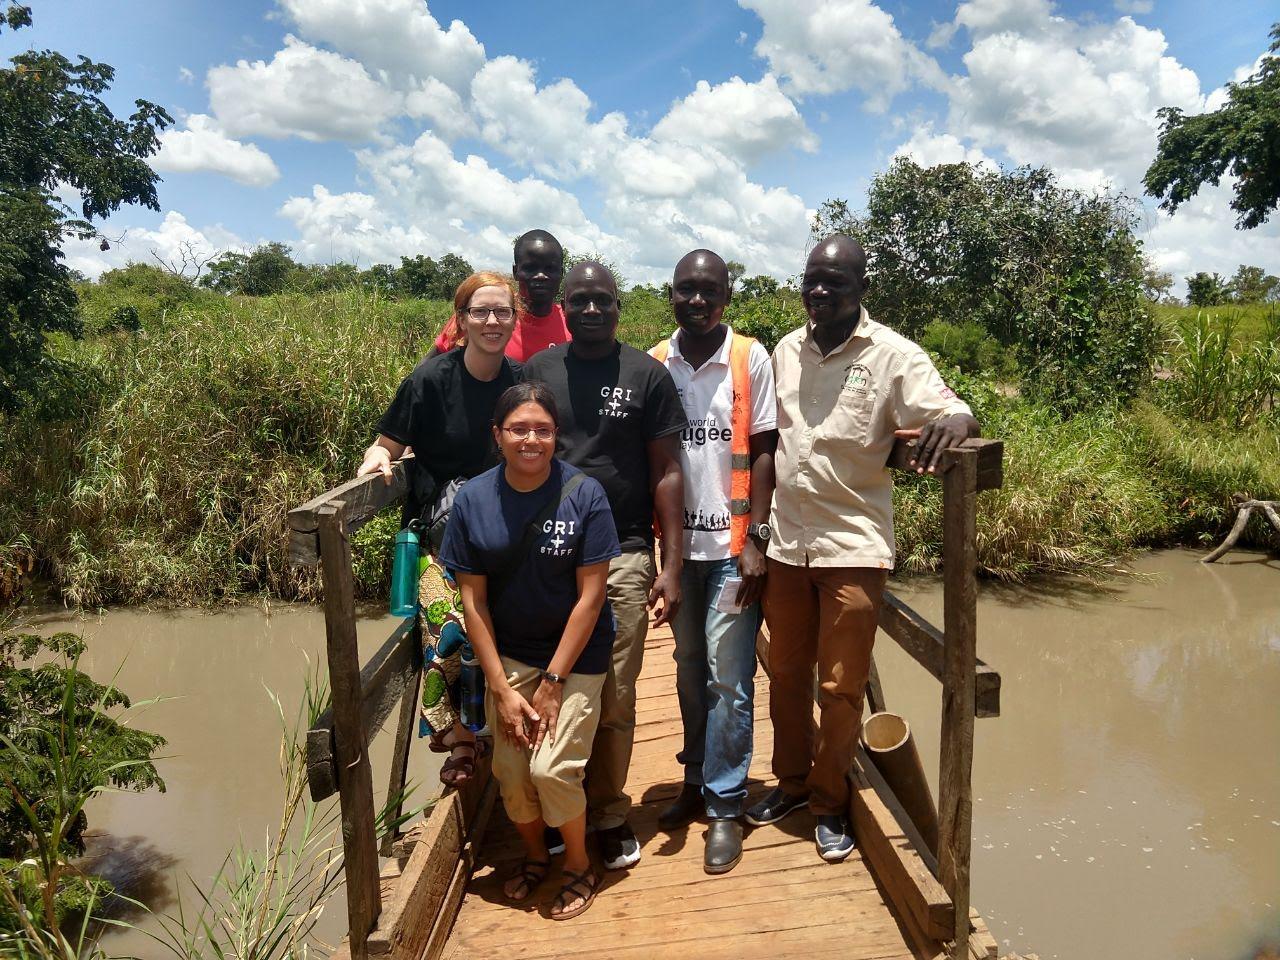 The bridge separating South Sudan and Uganda where refugees cross.